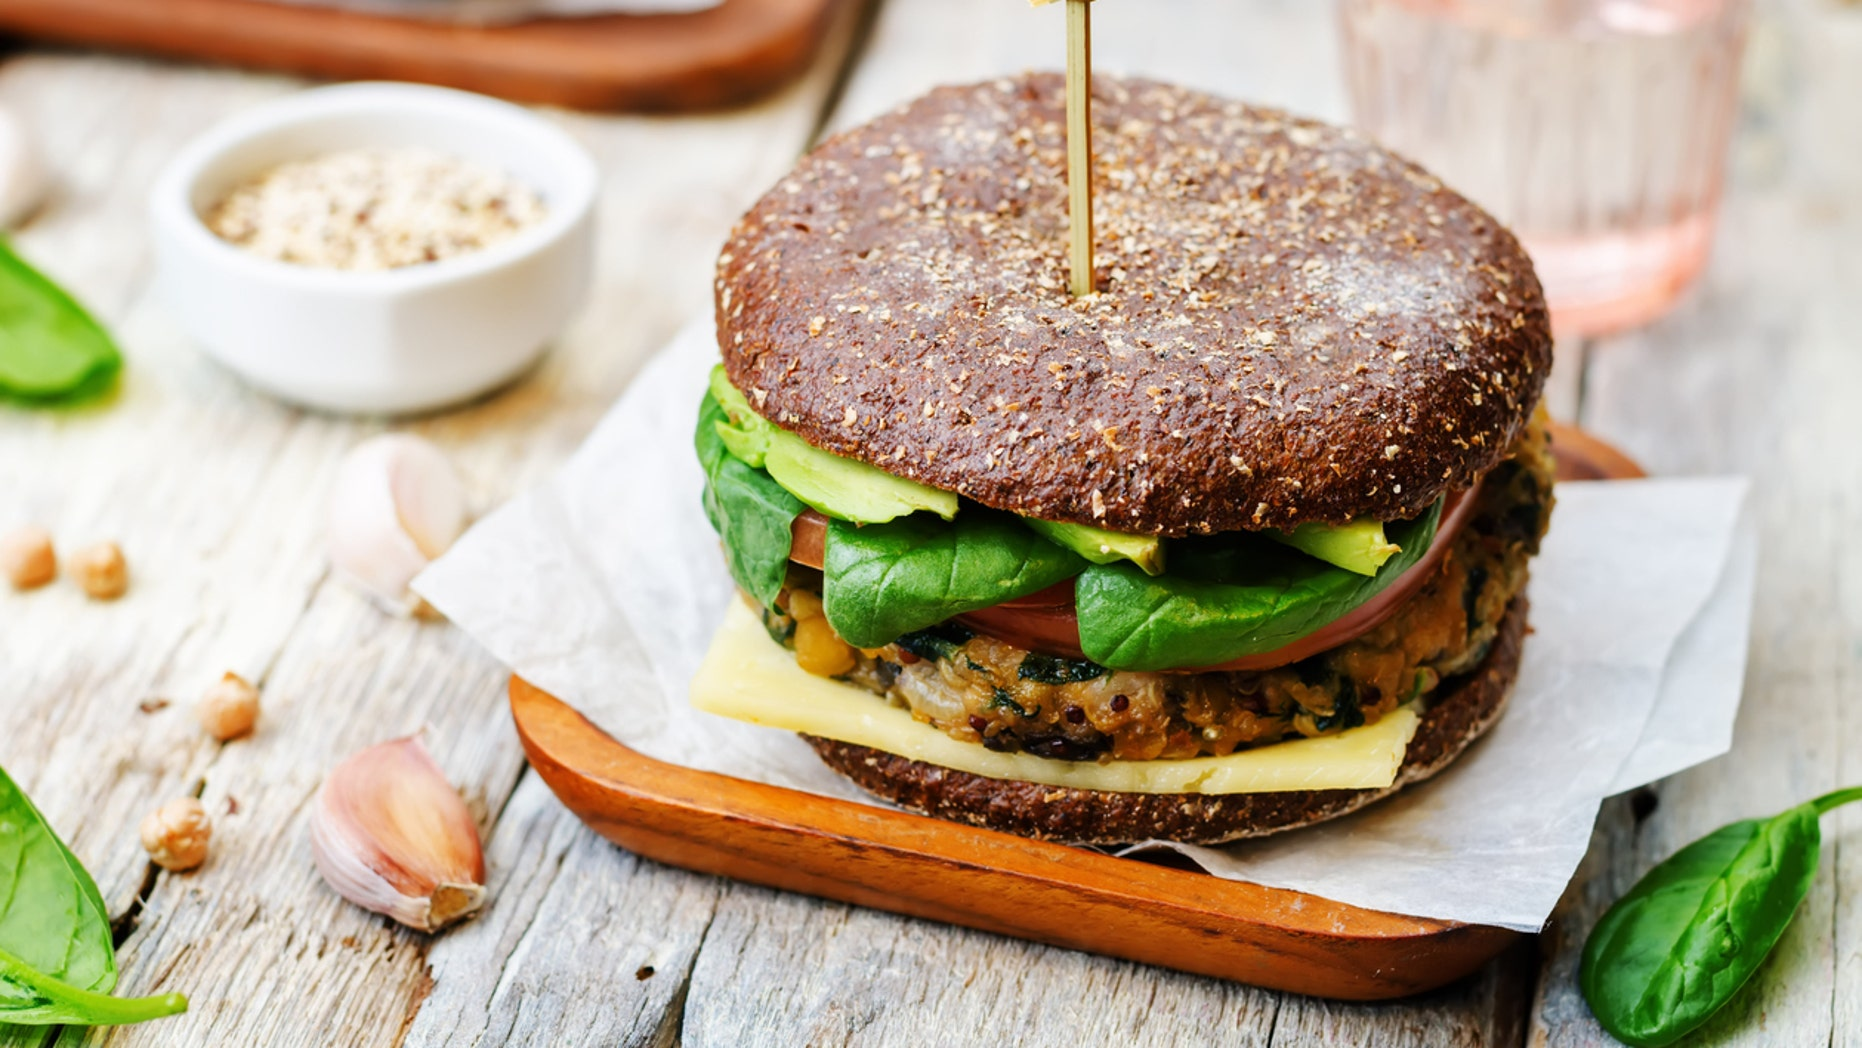 Quinoa burgers replace meat at certain Dallas restaurants